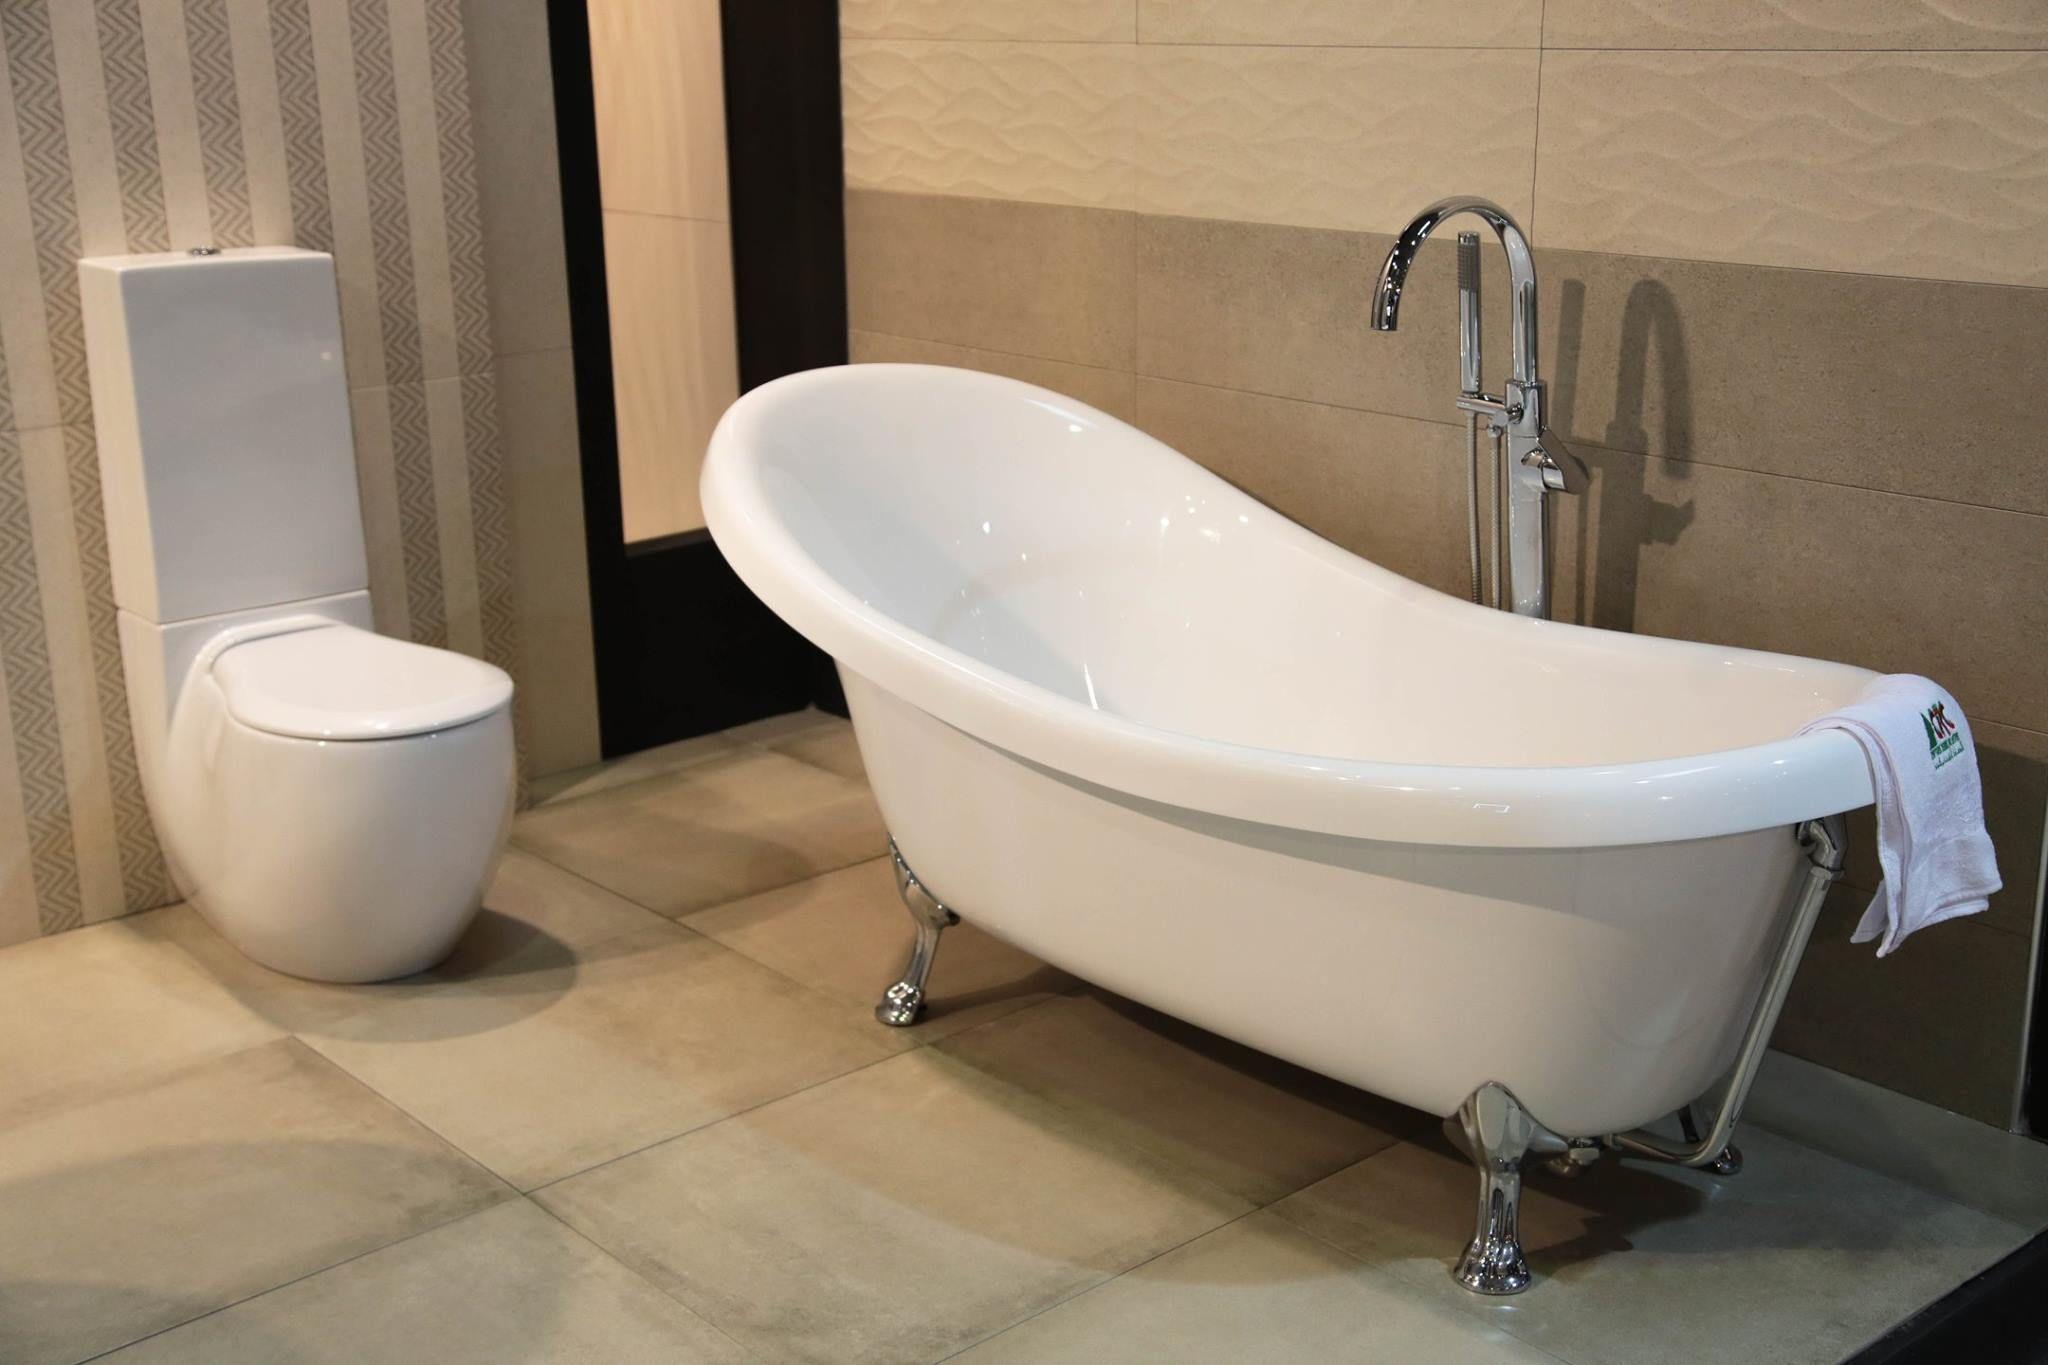 Sanitaire, Salle De Bain, Cuvette ,cuvette Design ,cuvette Art Ceram  ,baignoire